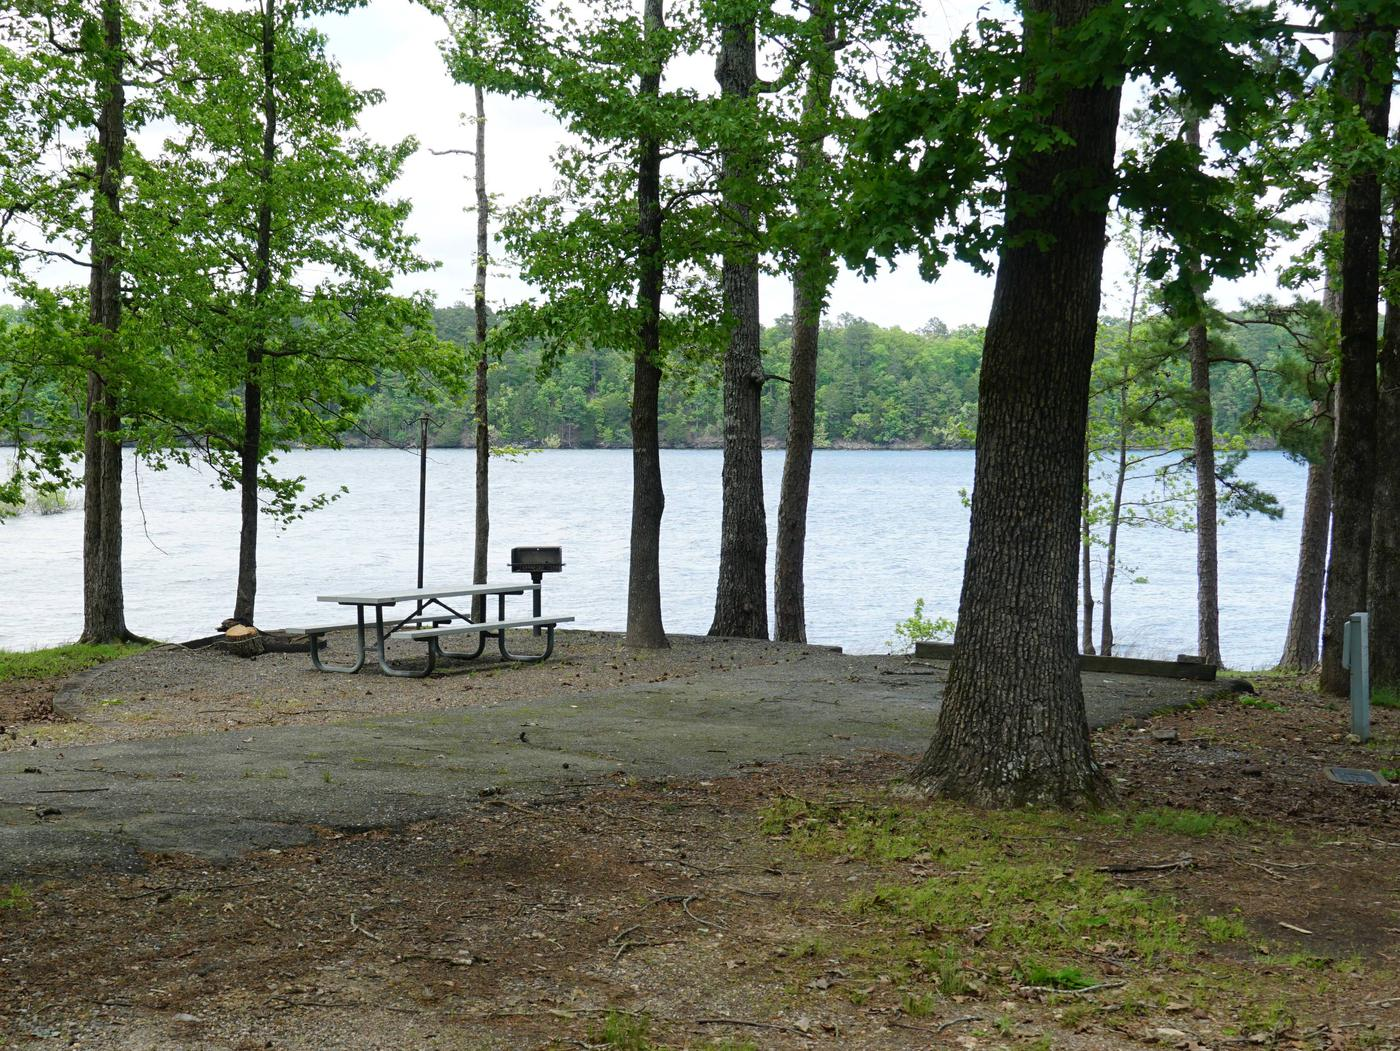 Tompkins Bend Campground, campsite # 38